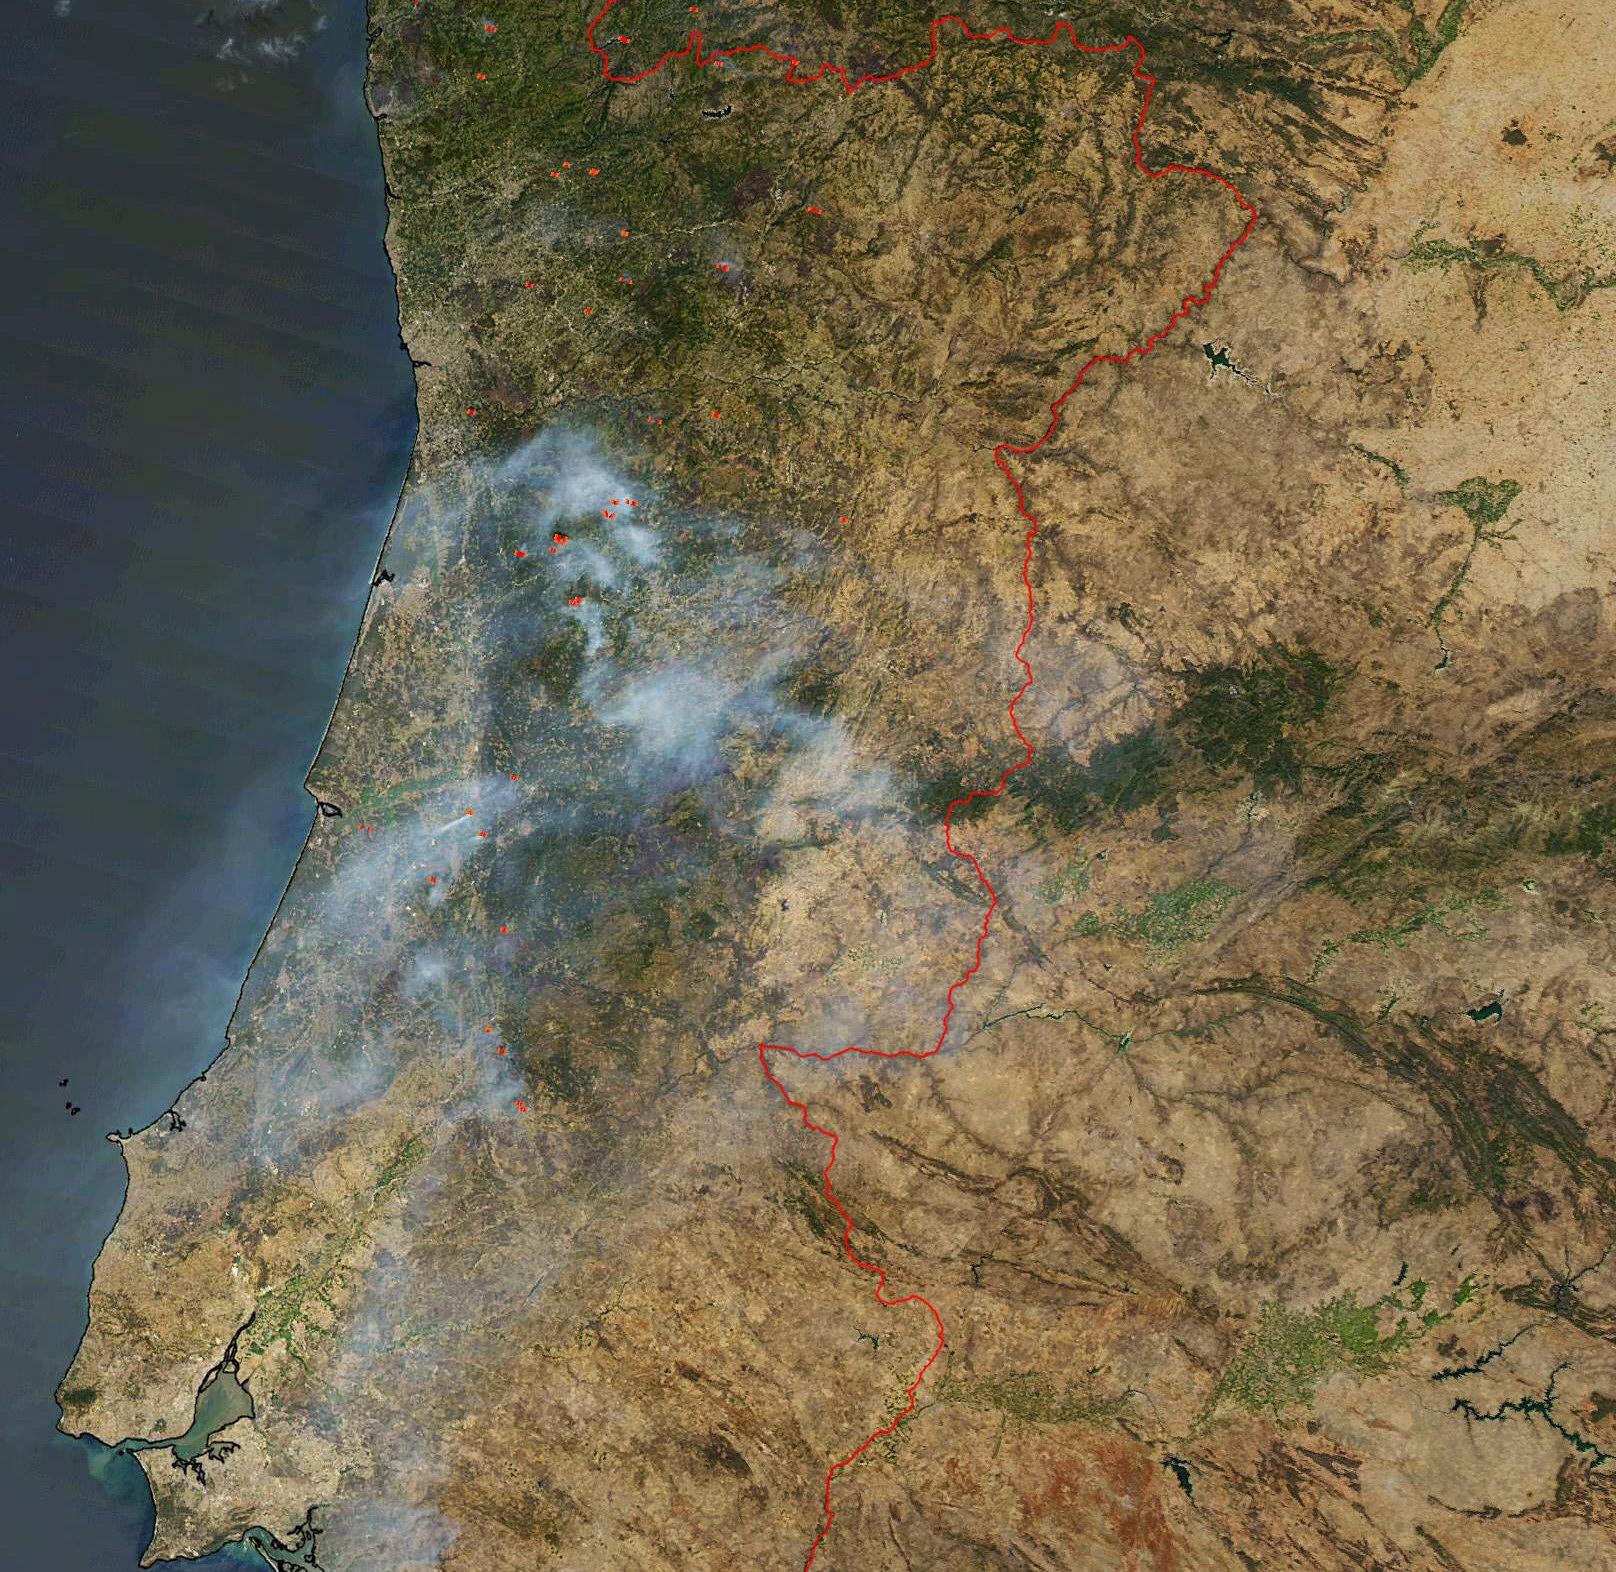 DLR DLRSchoolLab Infrared - Portugal map satellite